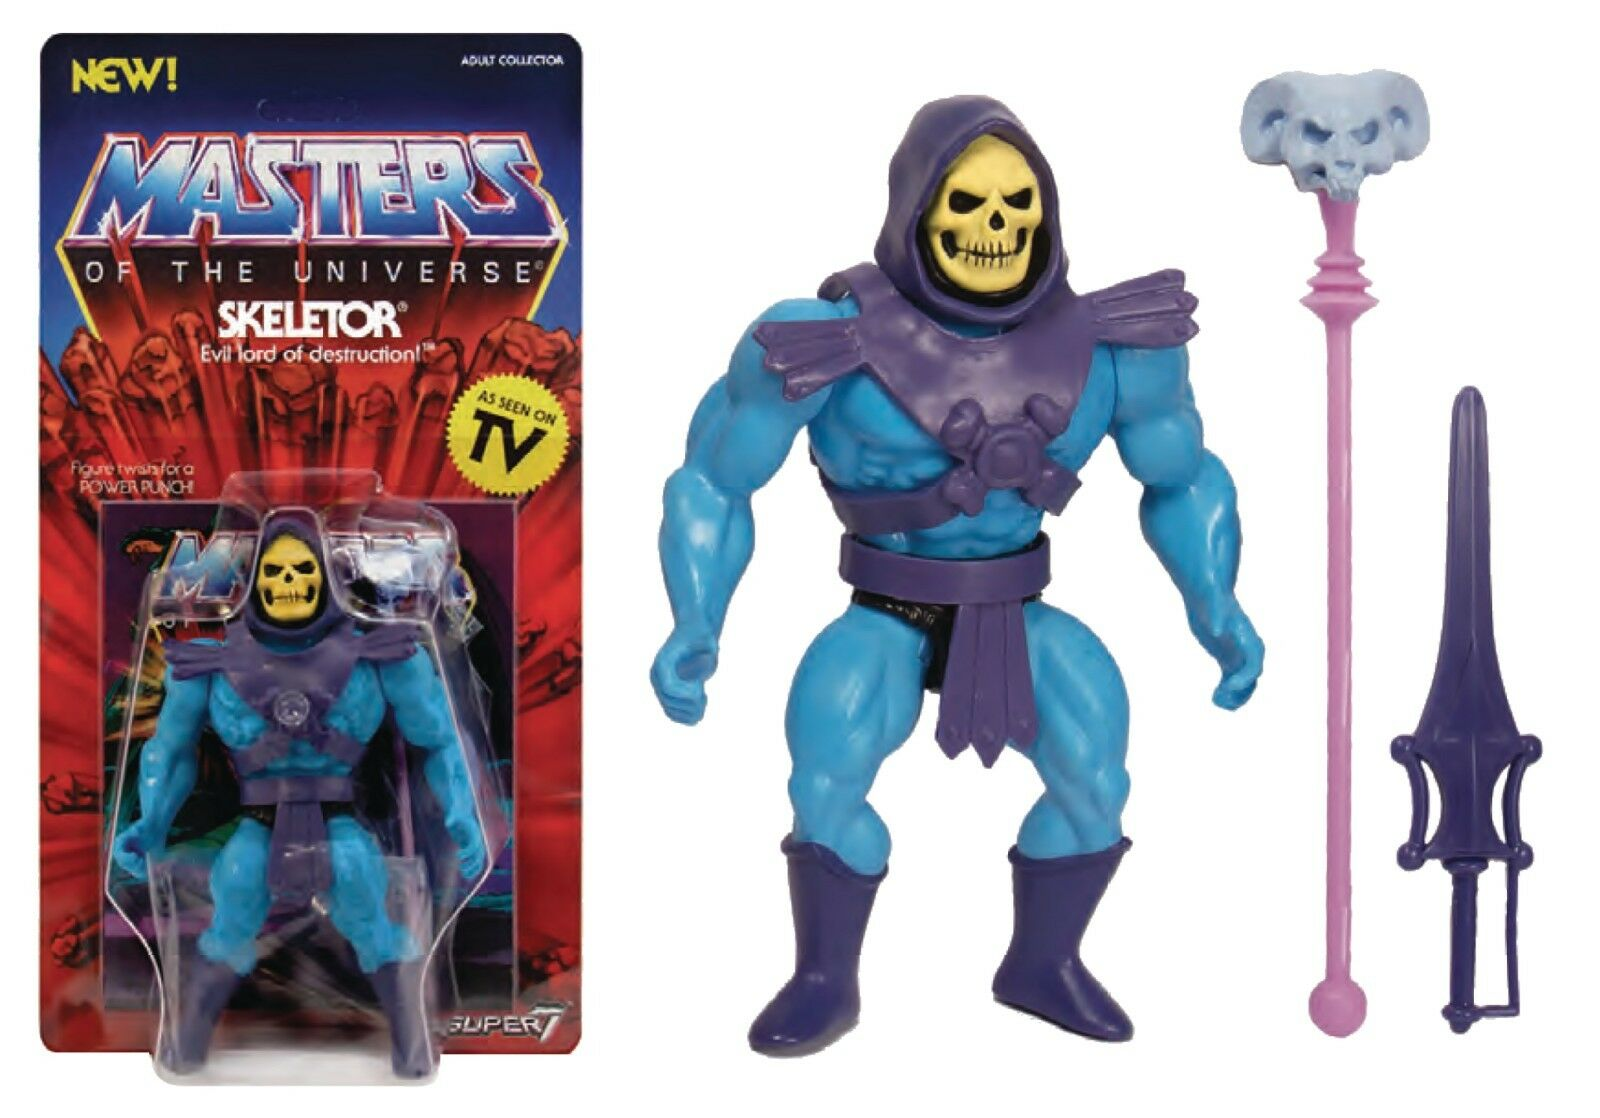 He-Man Masters Of The Universe MOTU  Classics Neo Vintage Super7 Skeletor MISB c